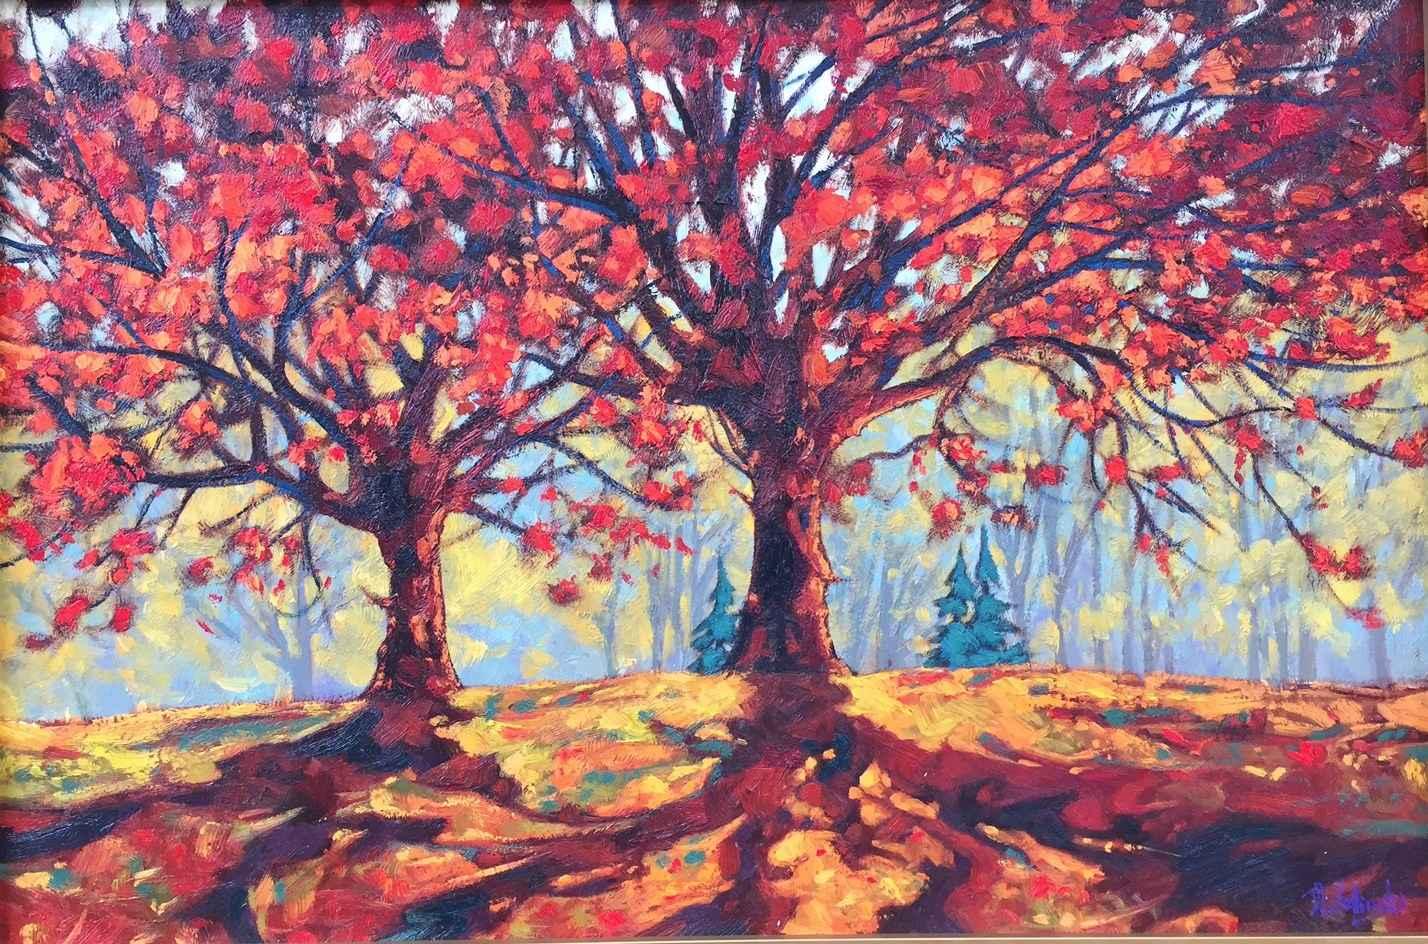 Leaves of Autumn by  Dominik Modlinski - Masterpiece Online